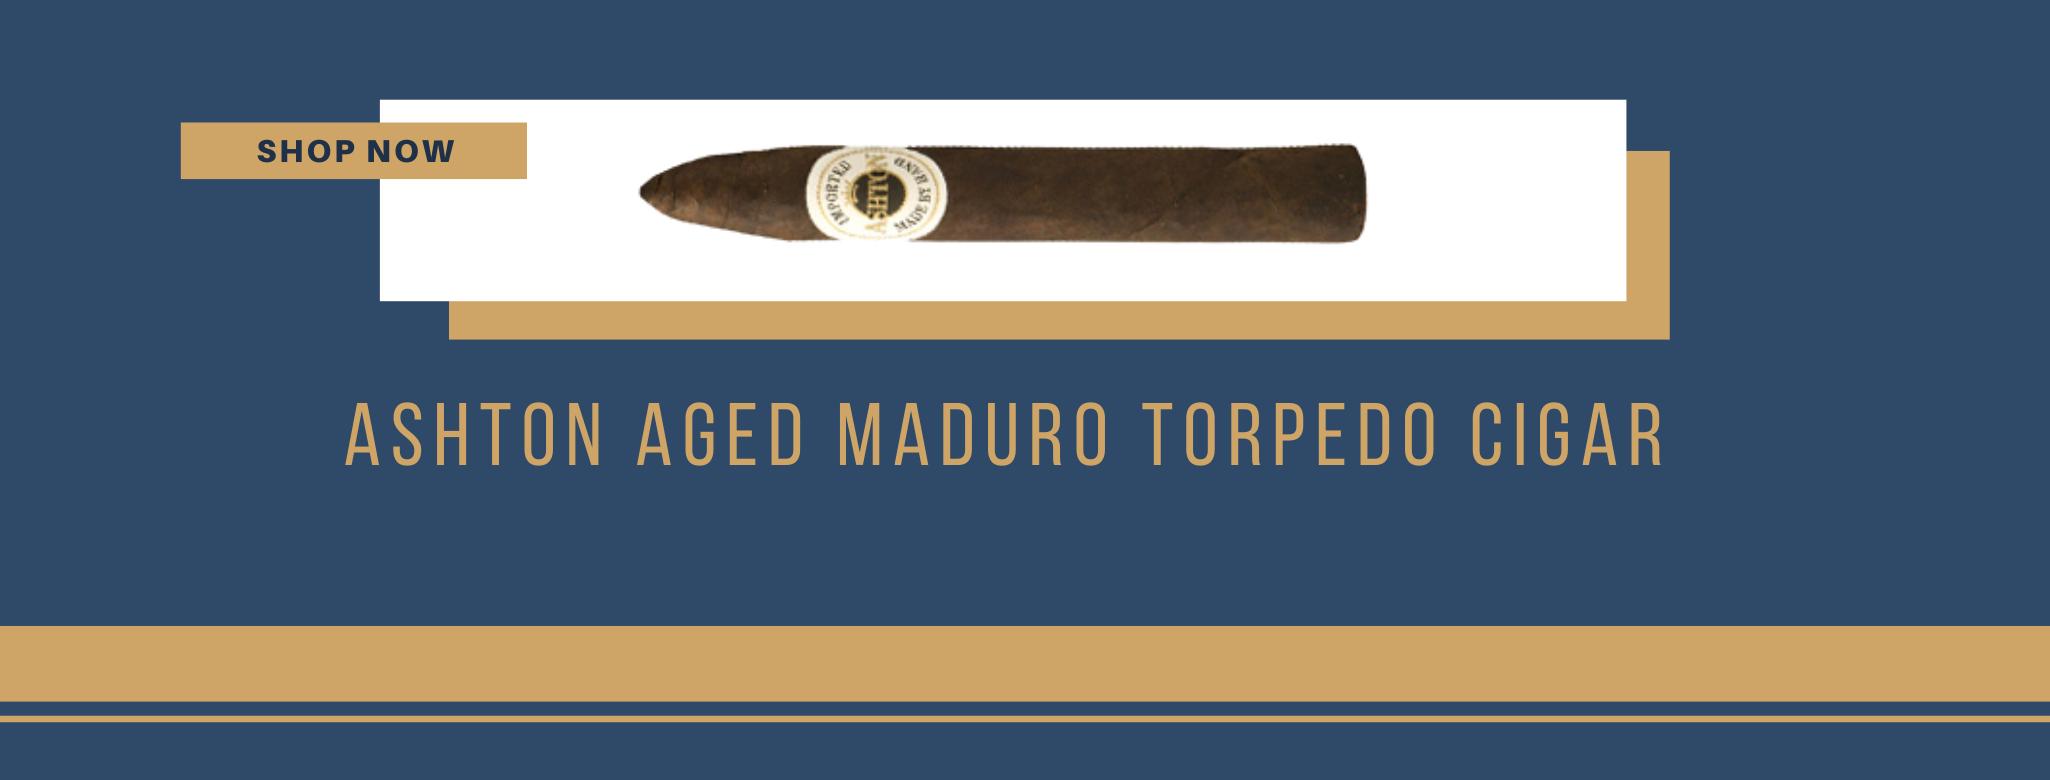 Buy Ashton Aged Maduro Torpedo Cigar online